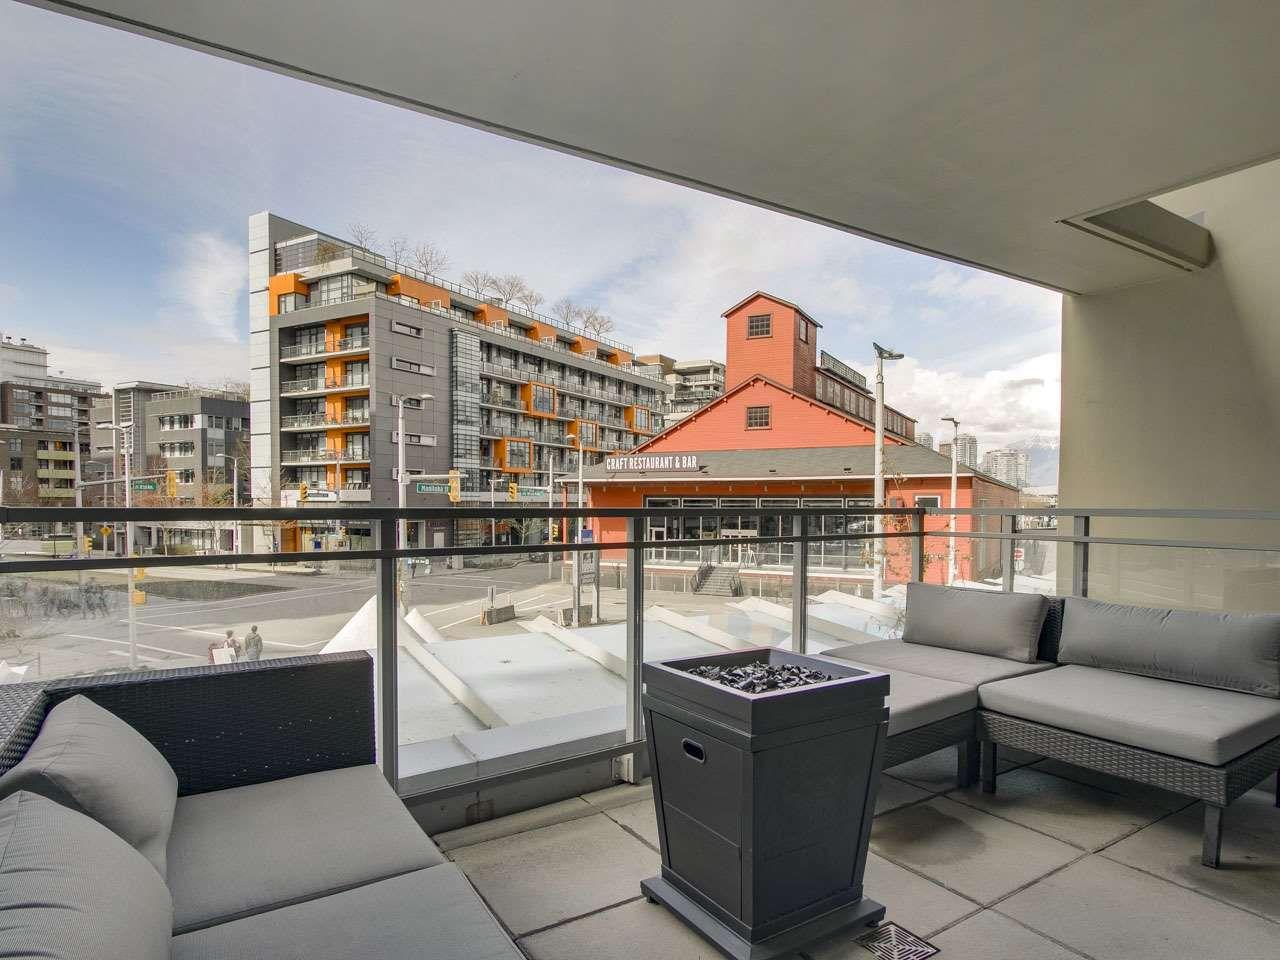 Main Photo: 205 88 W 1ST AVENUE in Vancouver: False Creek Condo for sale (Vancouver West)  : MLS®# R2149977